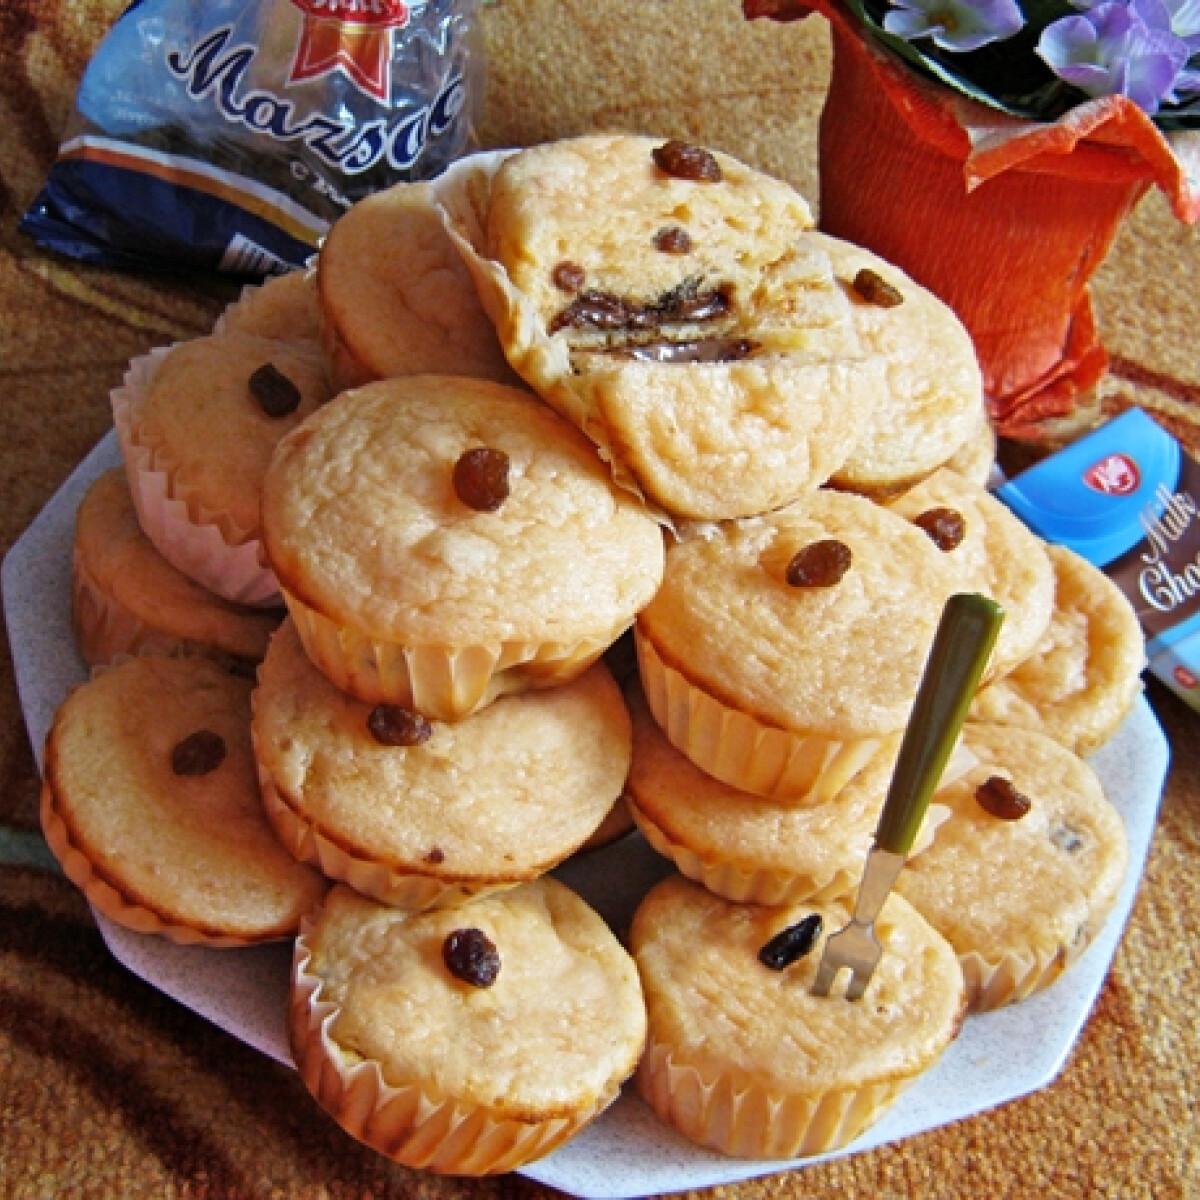 Táblacsokis muffin mazsolásan